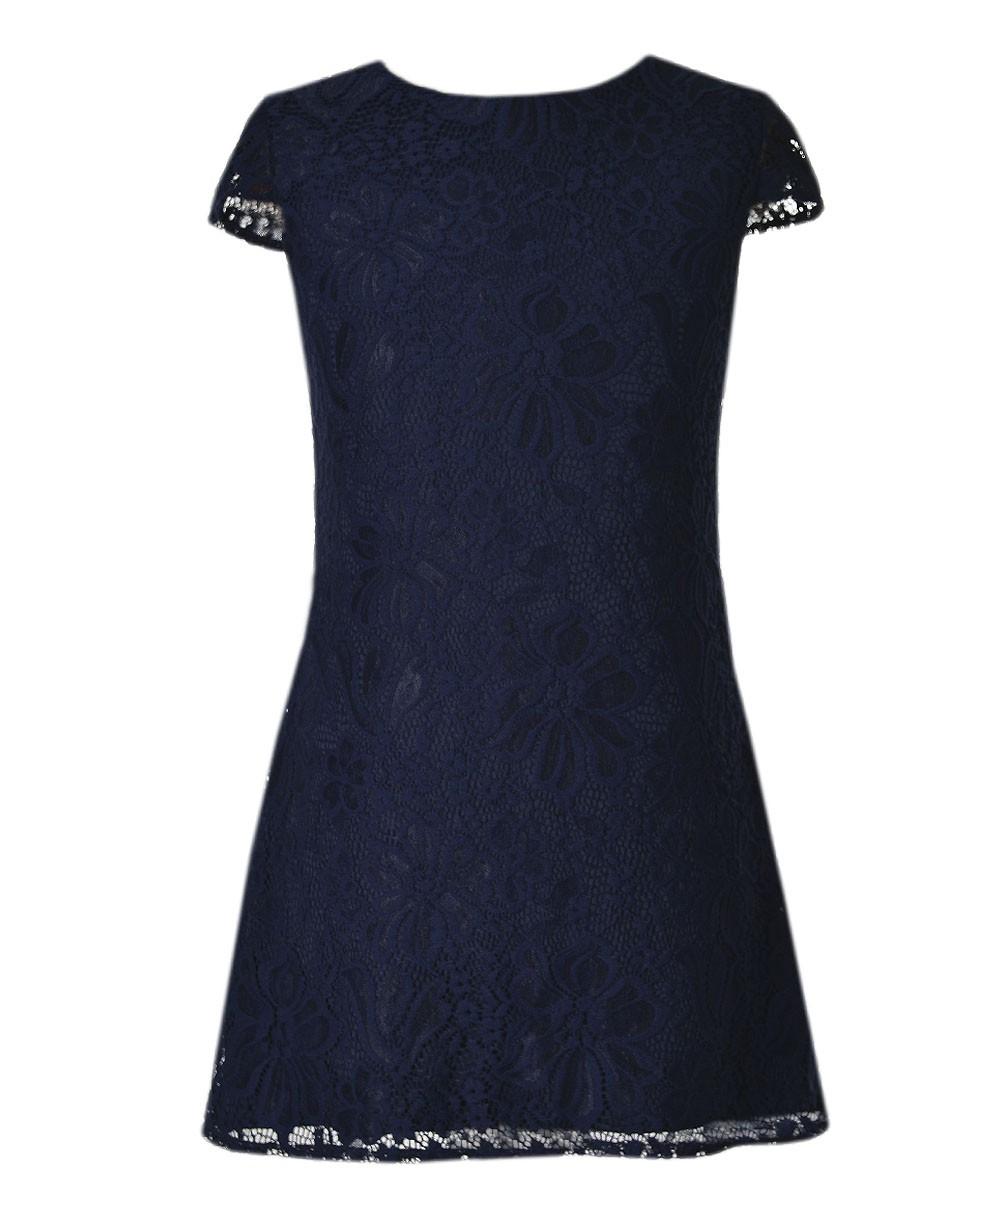 52082e6fbaddc1 wzor 100 emma sukienka koronka wizytowa , szkolna , na wesele1dress for a  girl, for